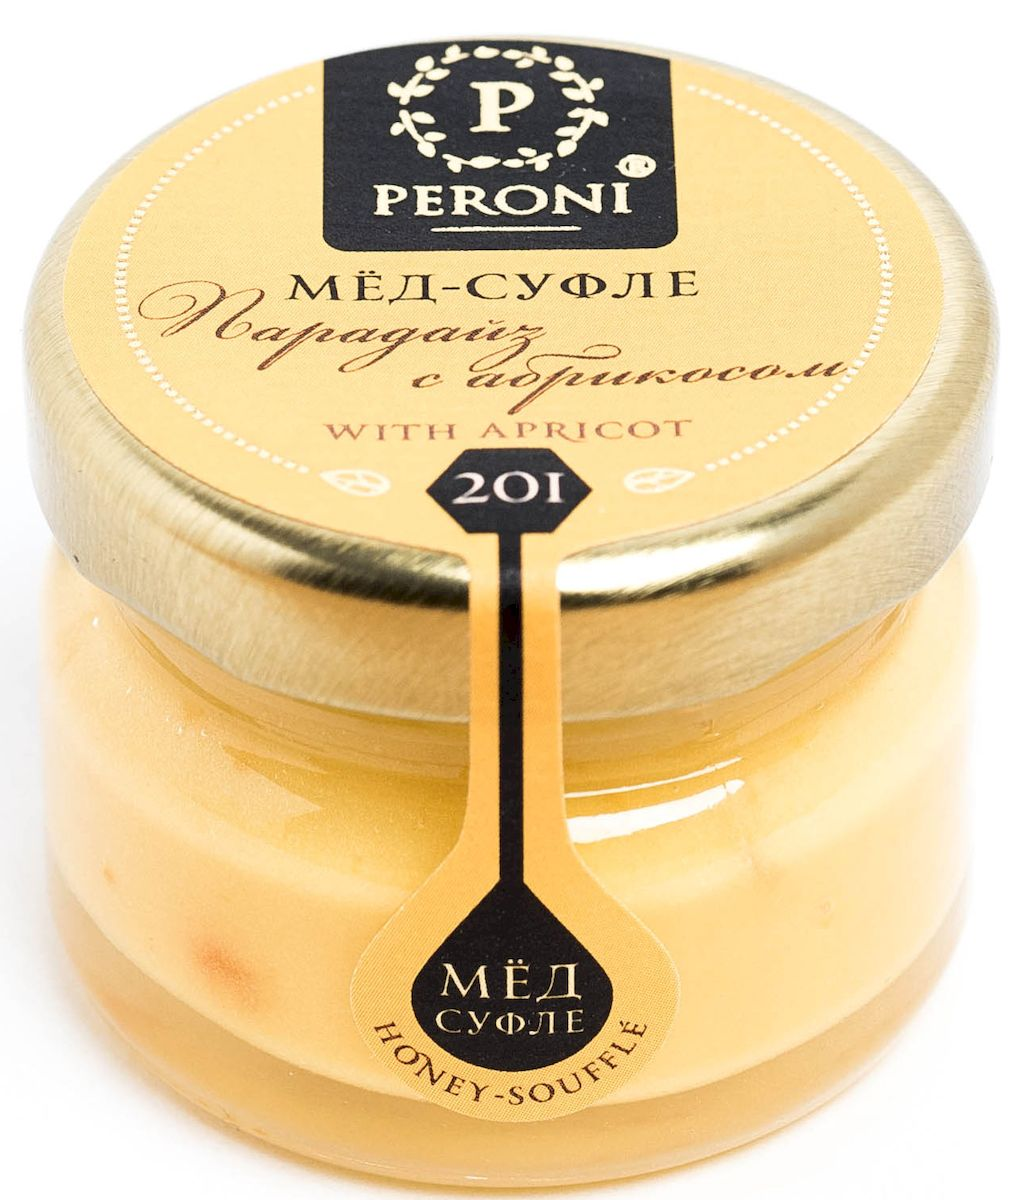 Peroni Парадайз с абрикосом мёд-суфле, 30 г peroni кедровый орешек мёд суфле 220 г